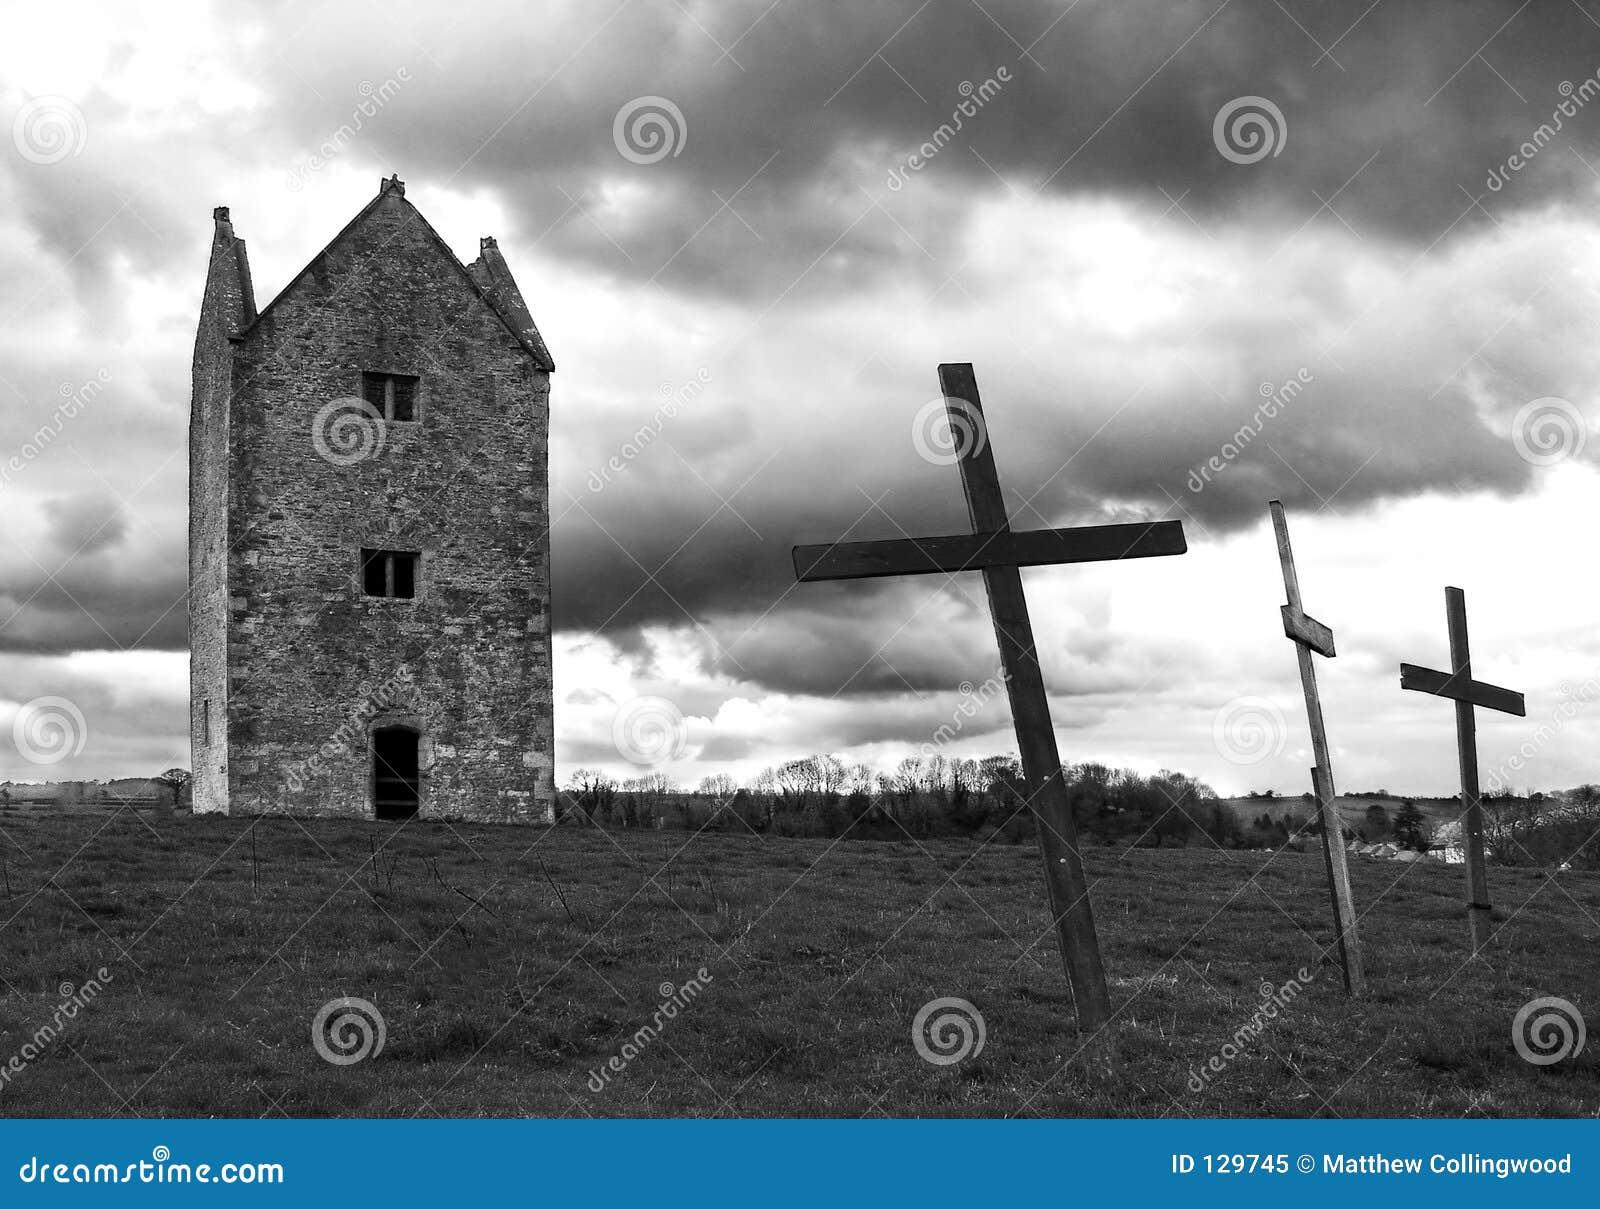 Priests House Bruton